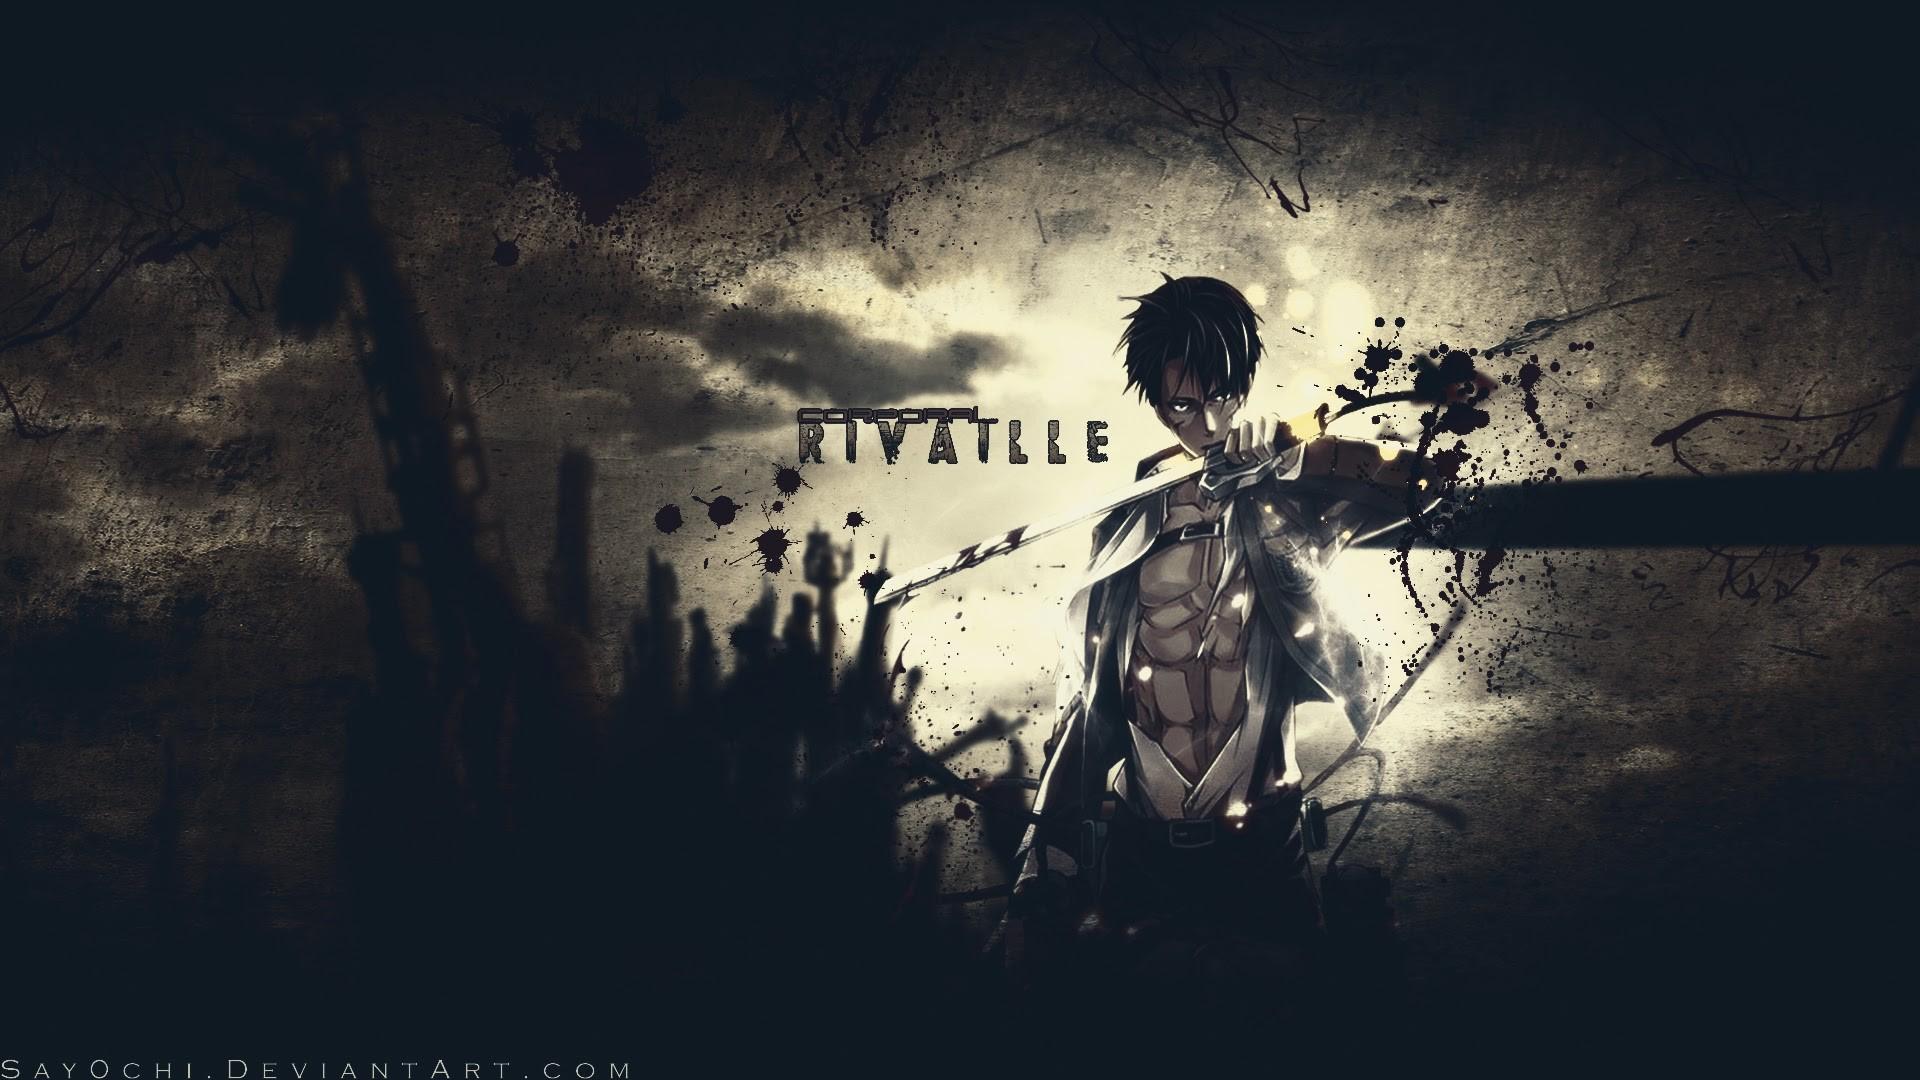 levi rivaille ttack on titan shingeki no kyojin anime hd wallpaper .